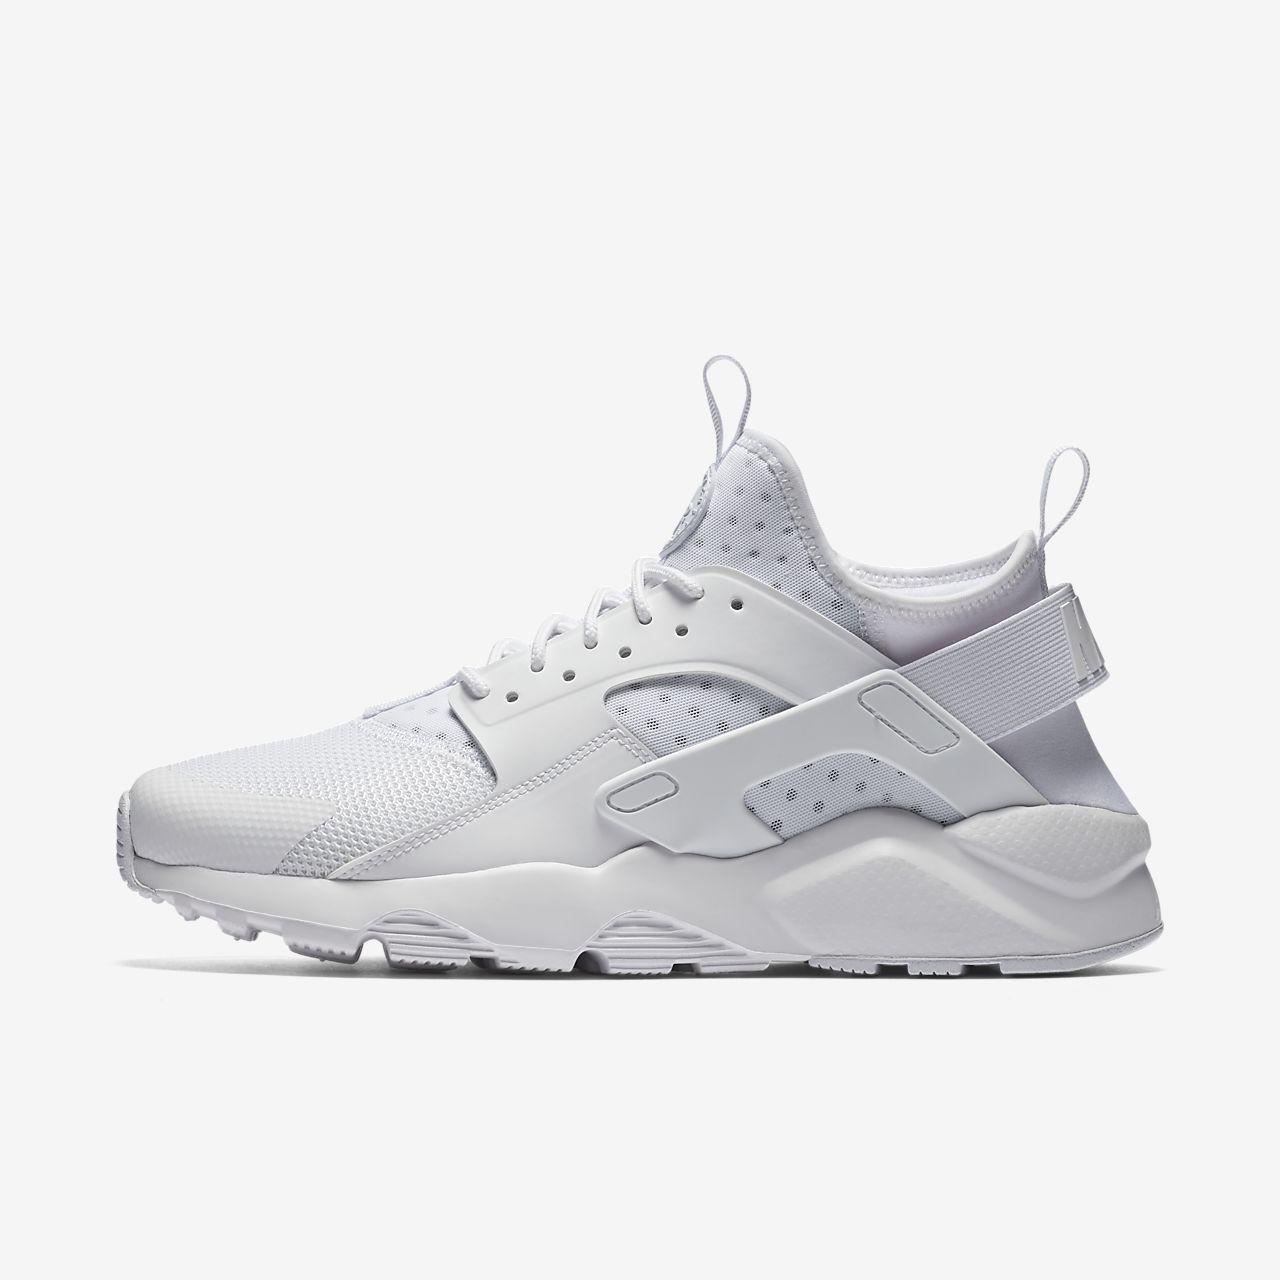 977df7ad3624 Мужские кроссовки Nike Air Huarache Ultra. Nike.com RU